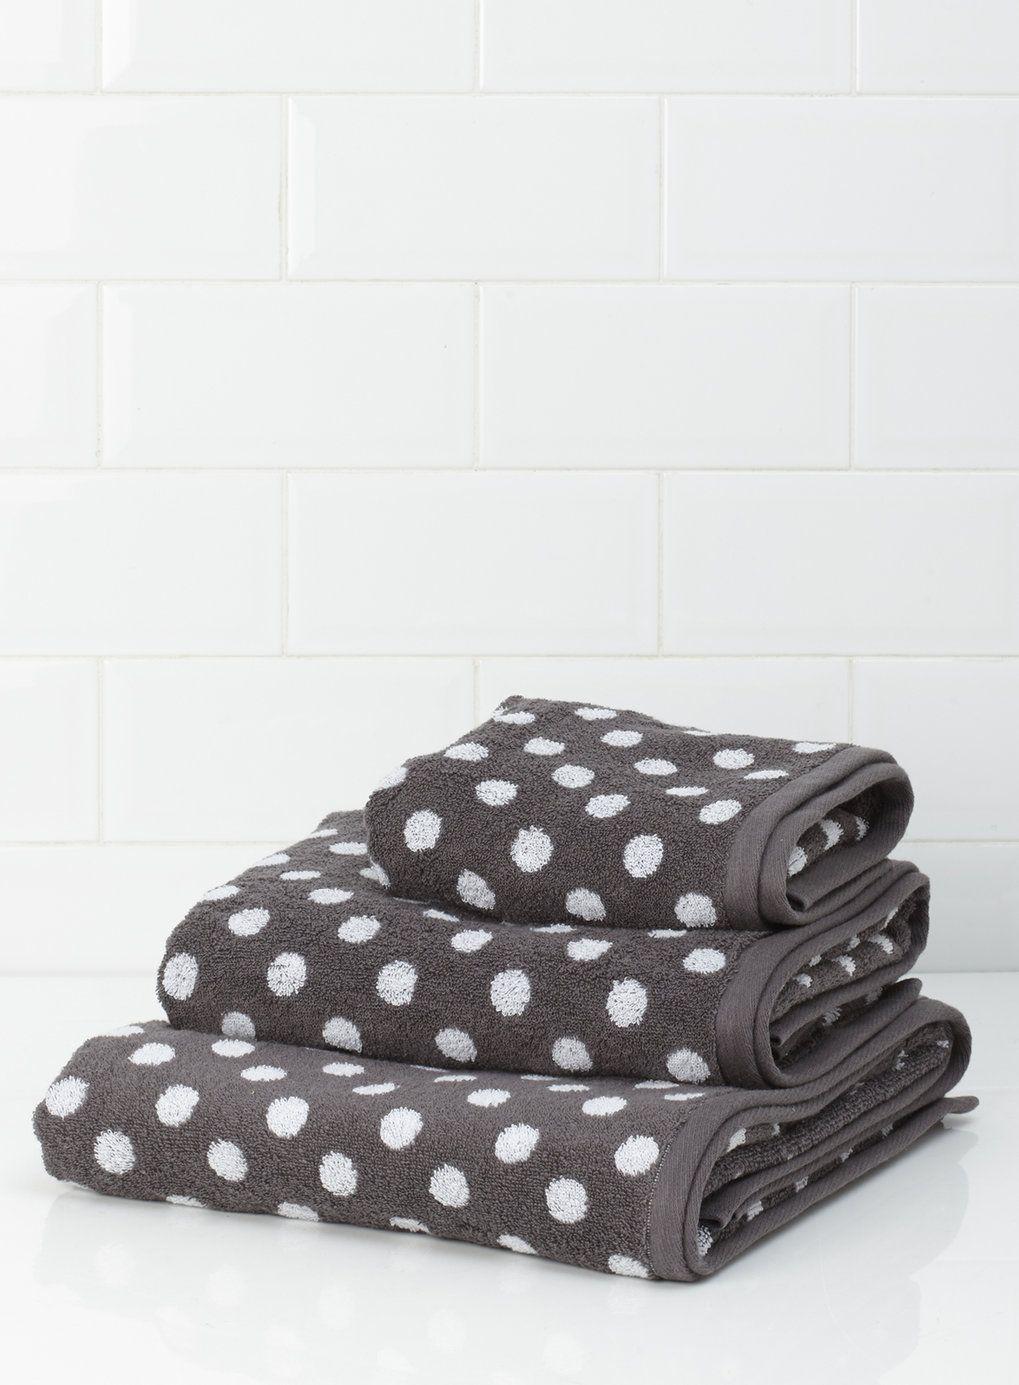 Grey Polka Dot Towel BHS New House Pinterest Hand Towels - Bhs monochrome word bath sheet bhs monochrome word hand towel